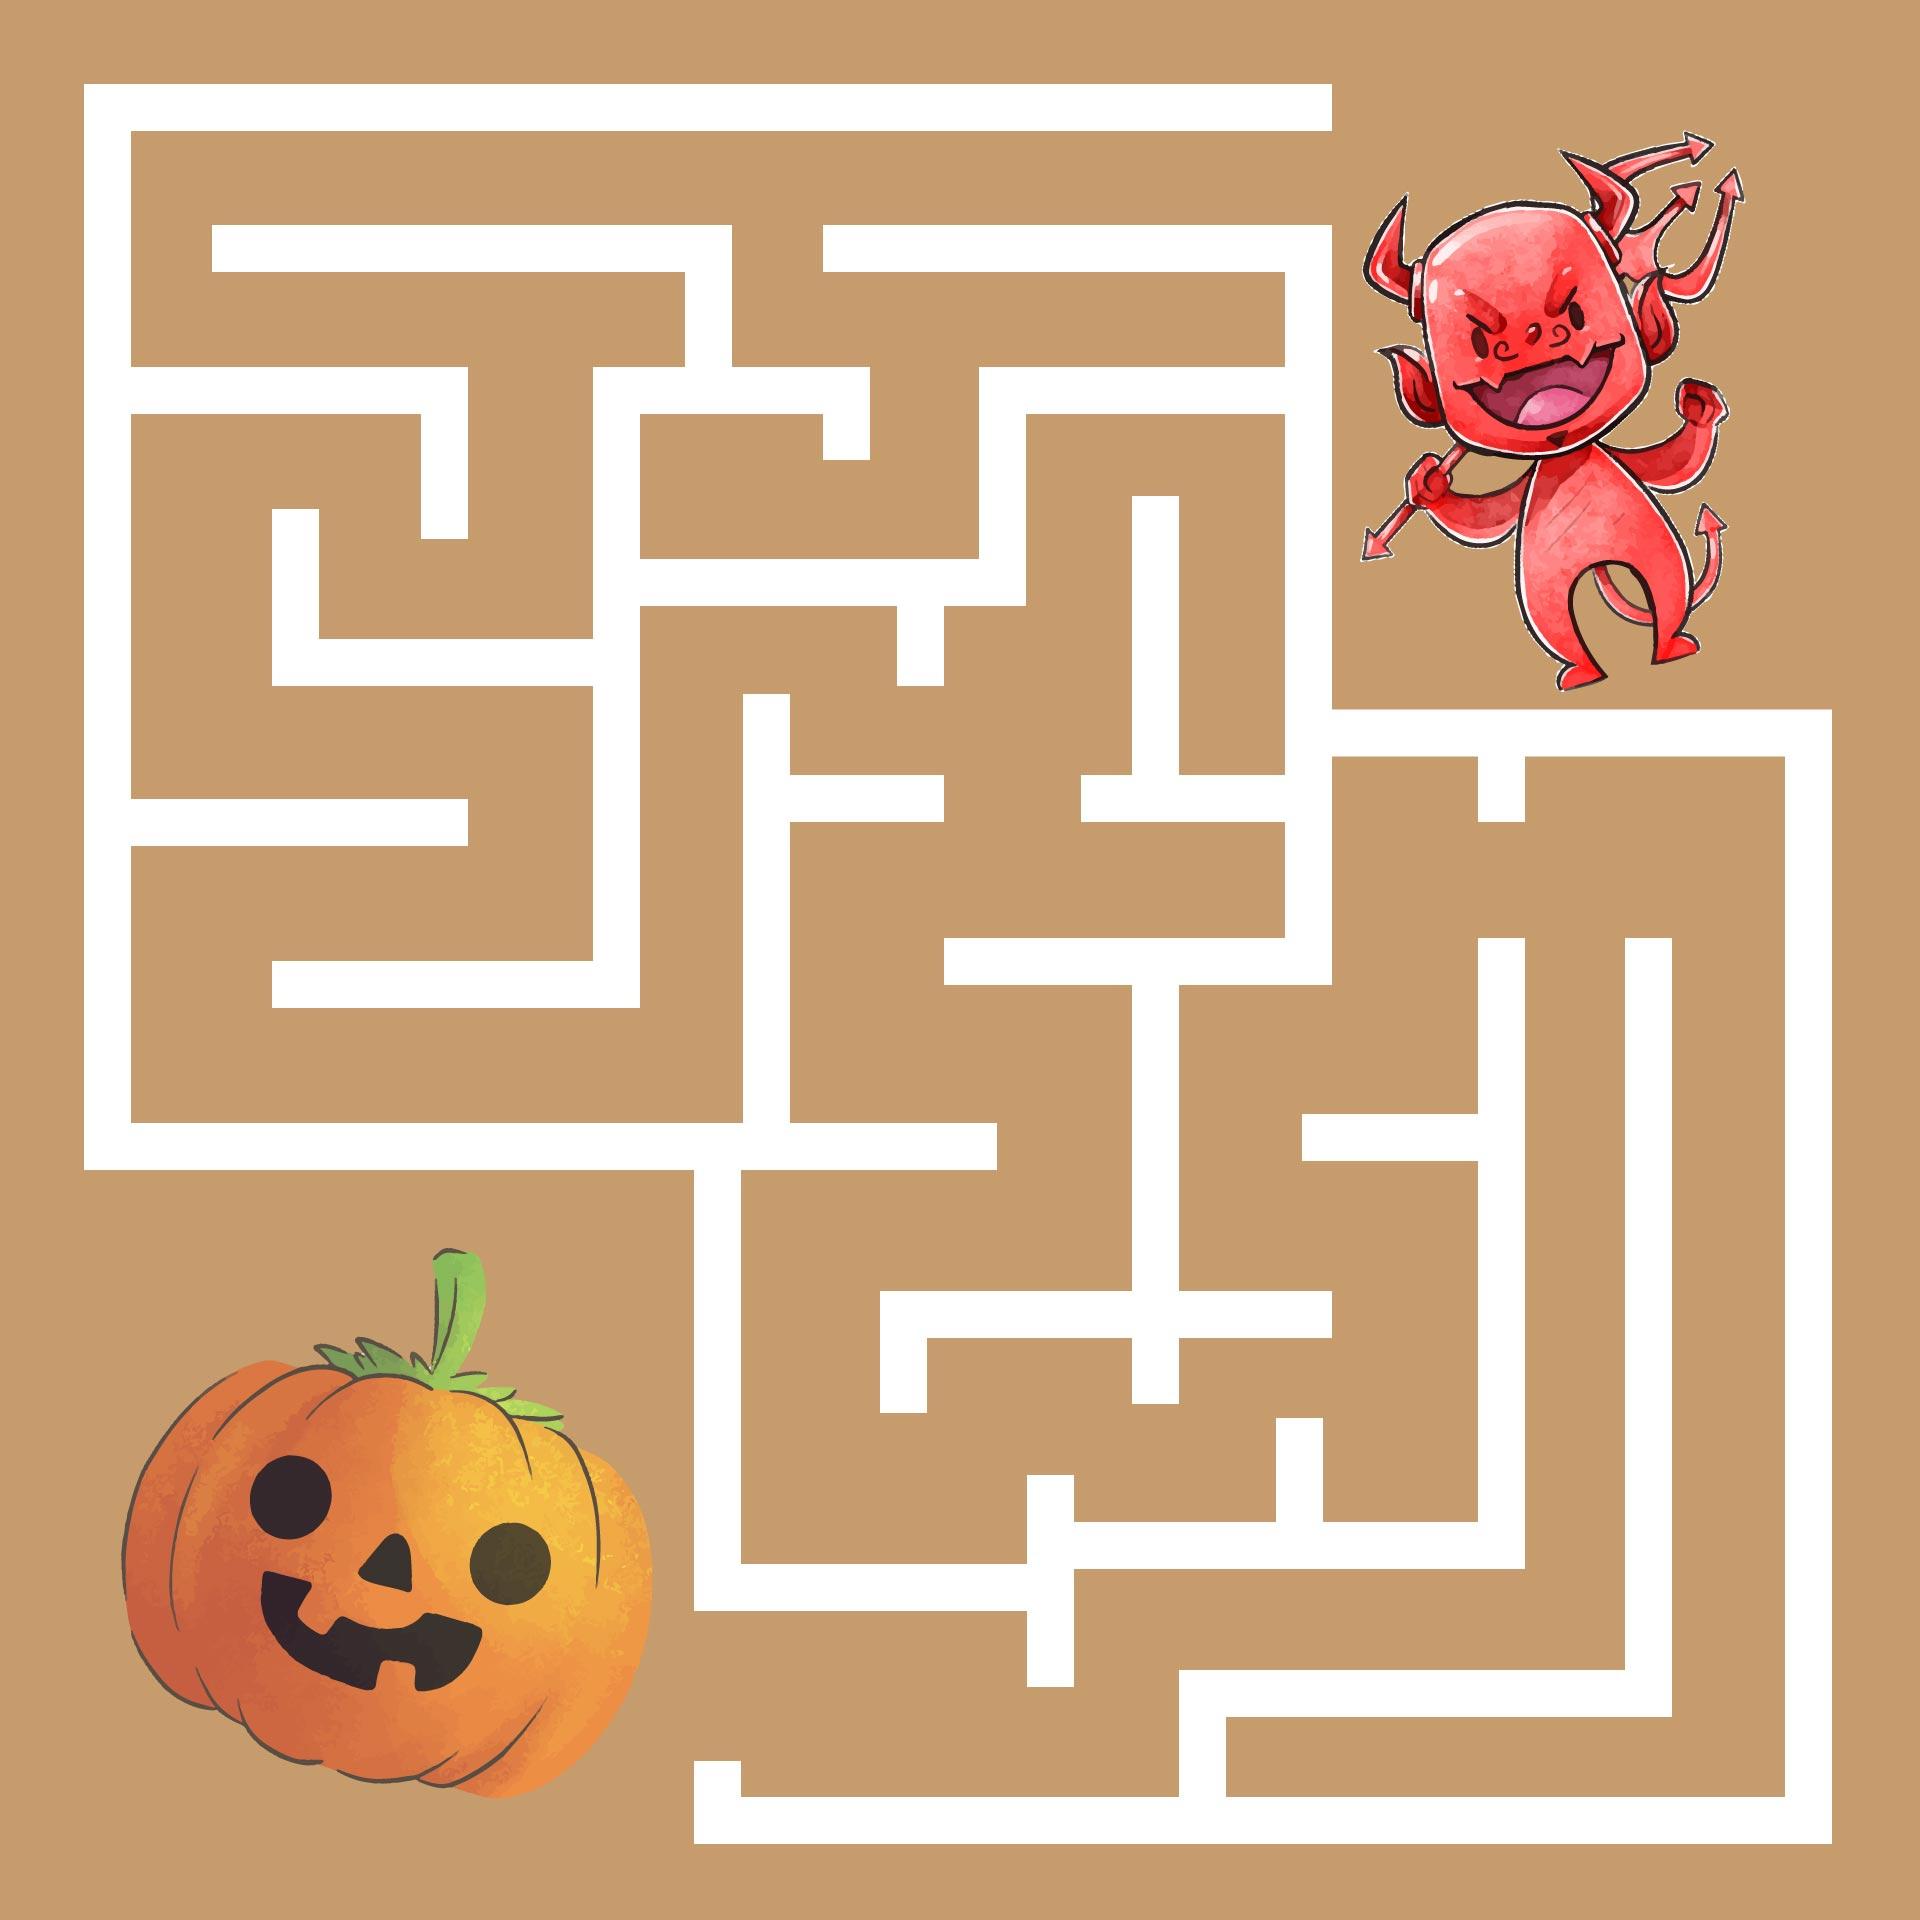 Halloween Maze Red Devil And Pumpkin